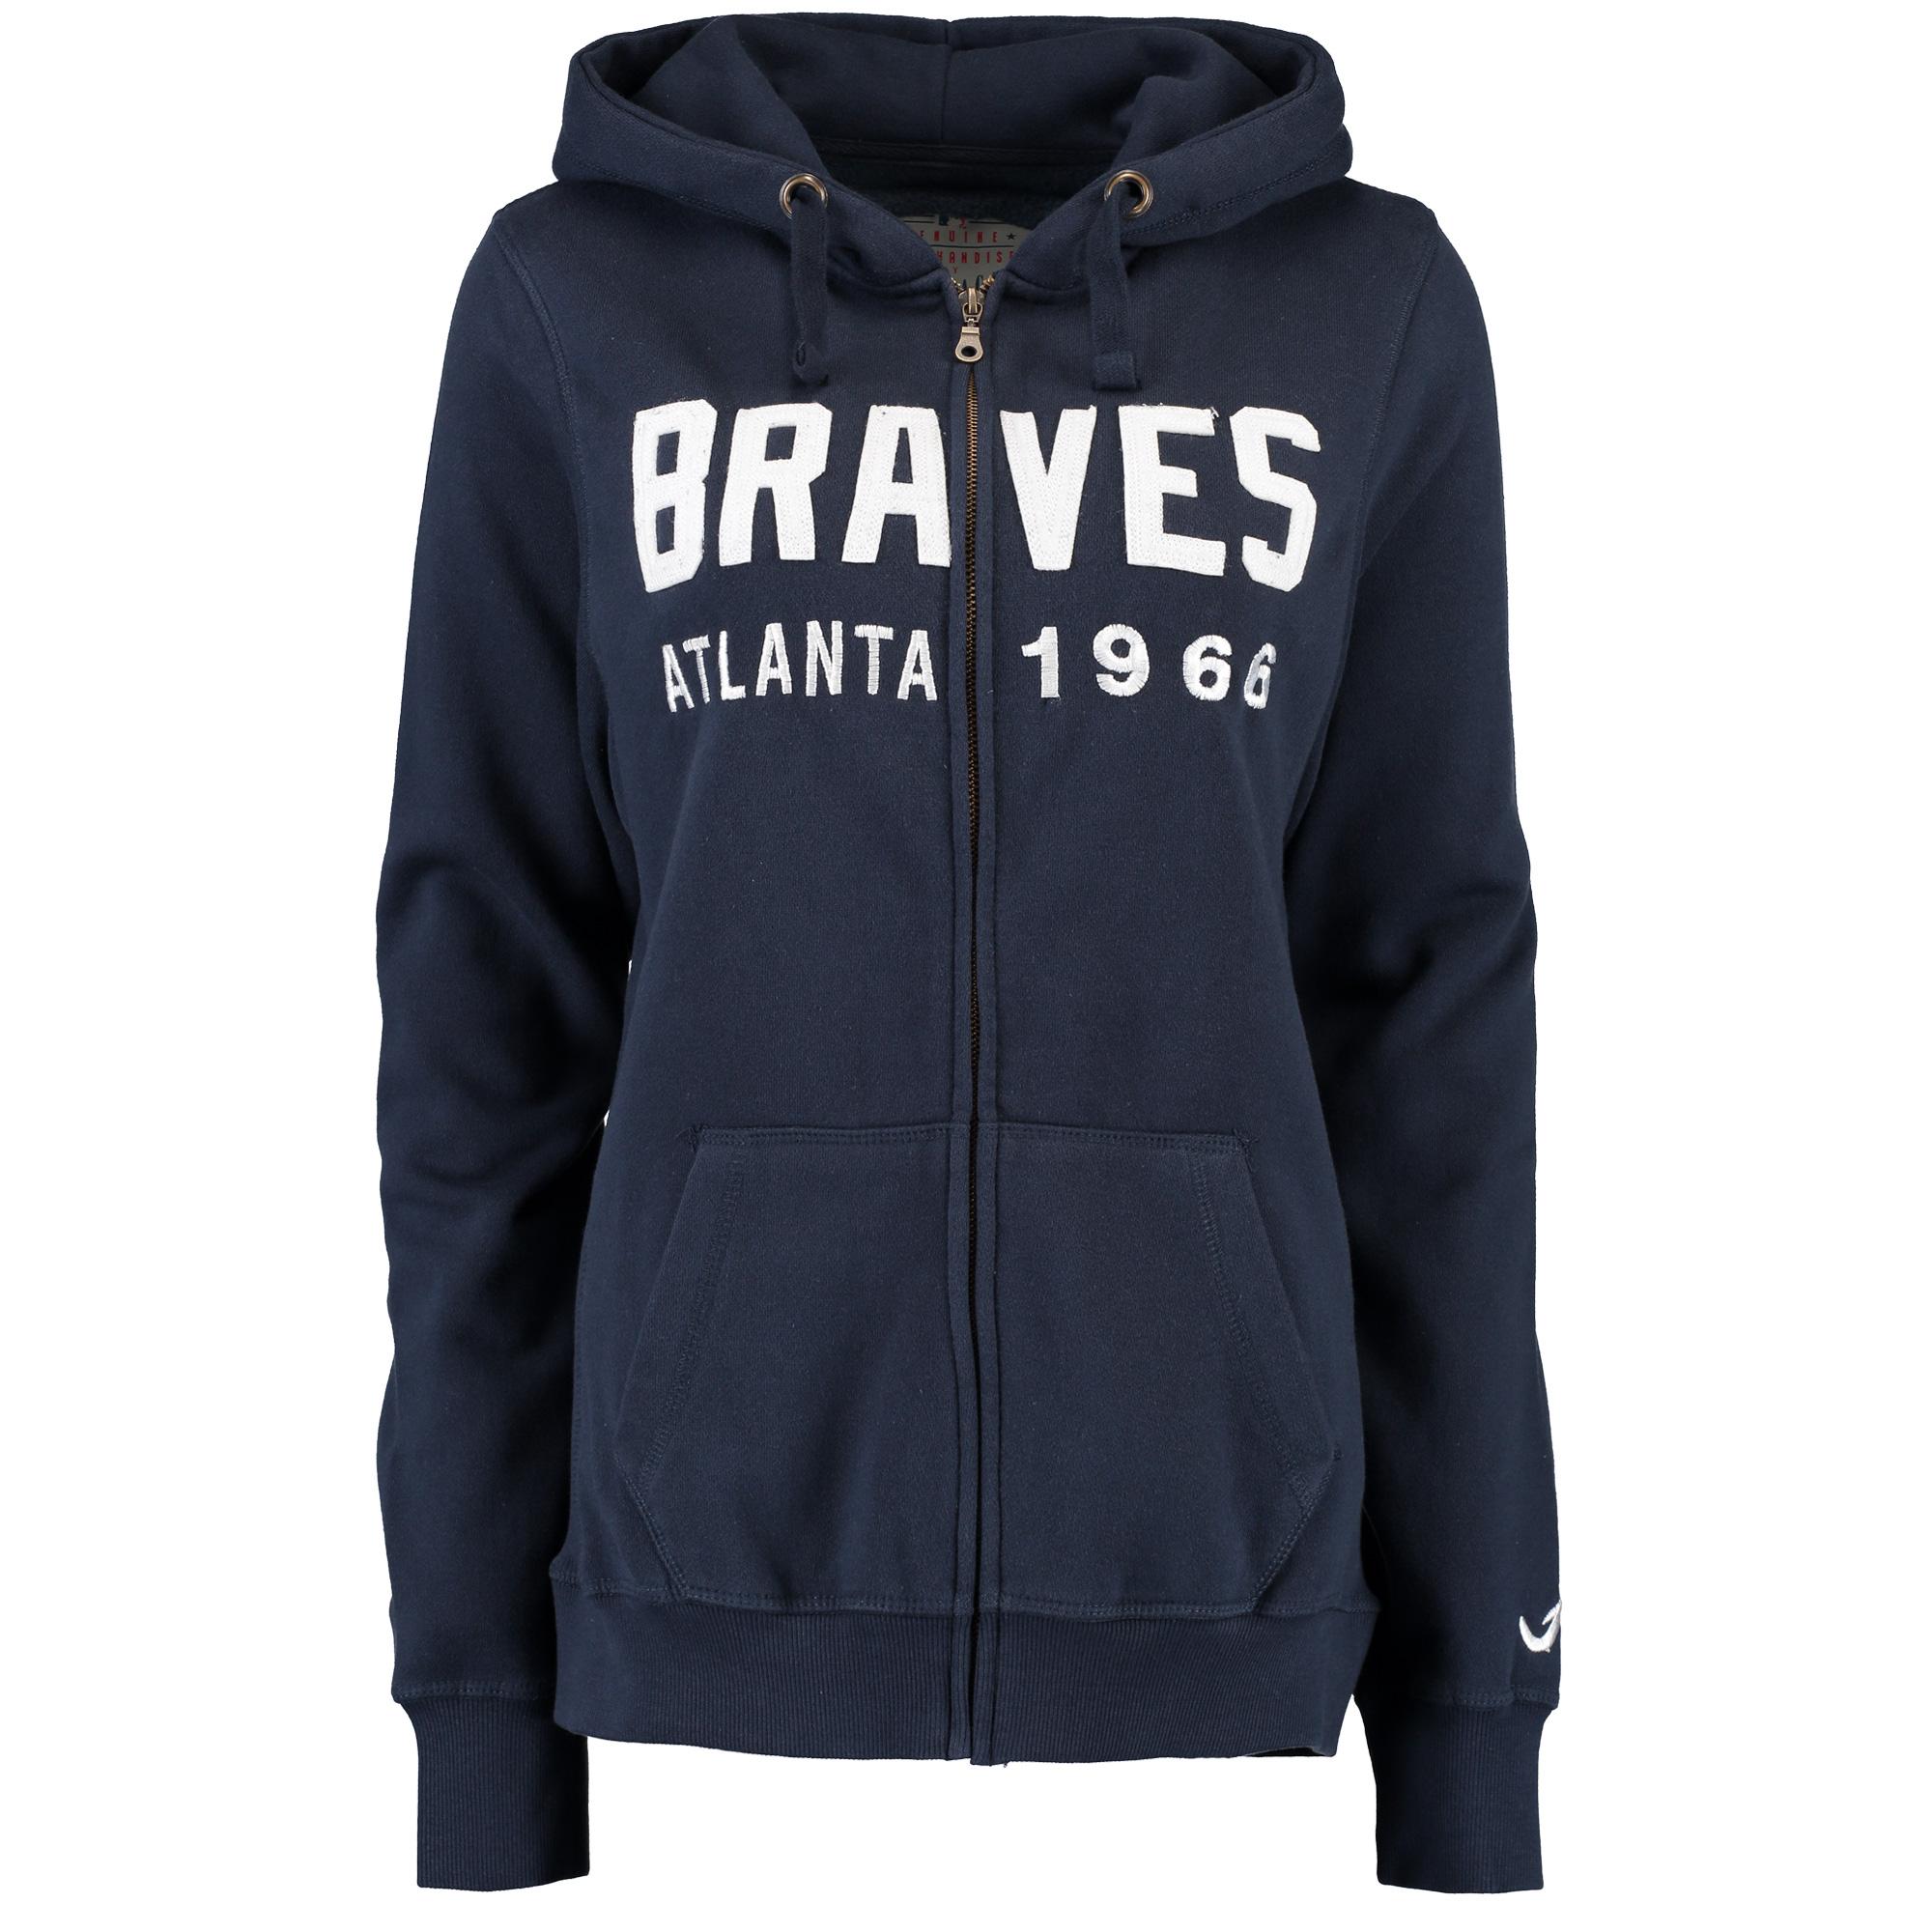 Atlanta Braves Soft as a Grape Women's Full-Zip Hoodie - Navy